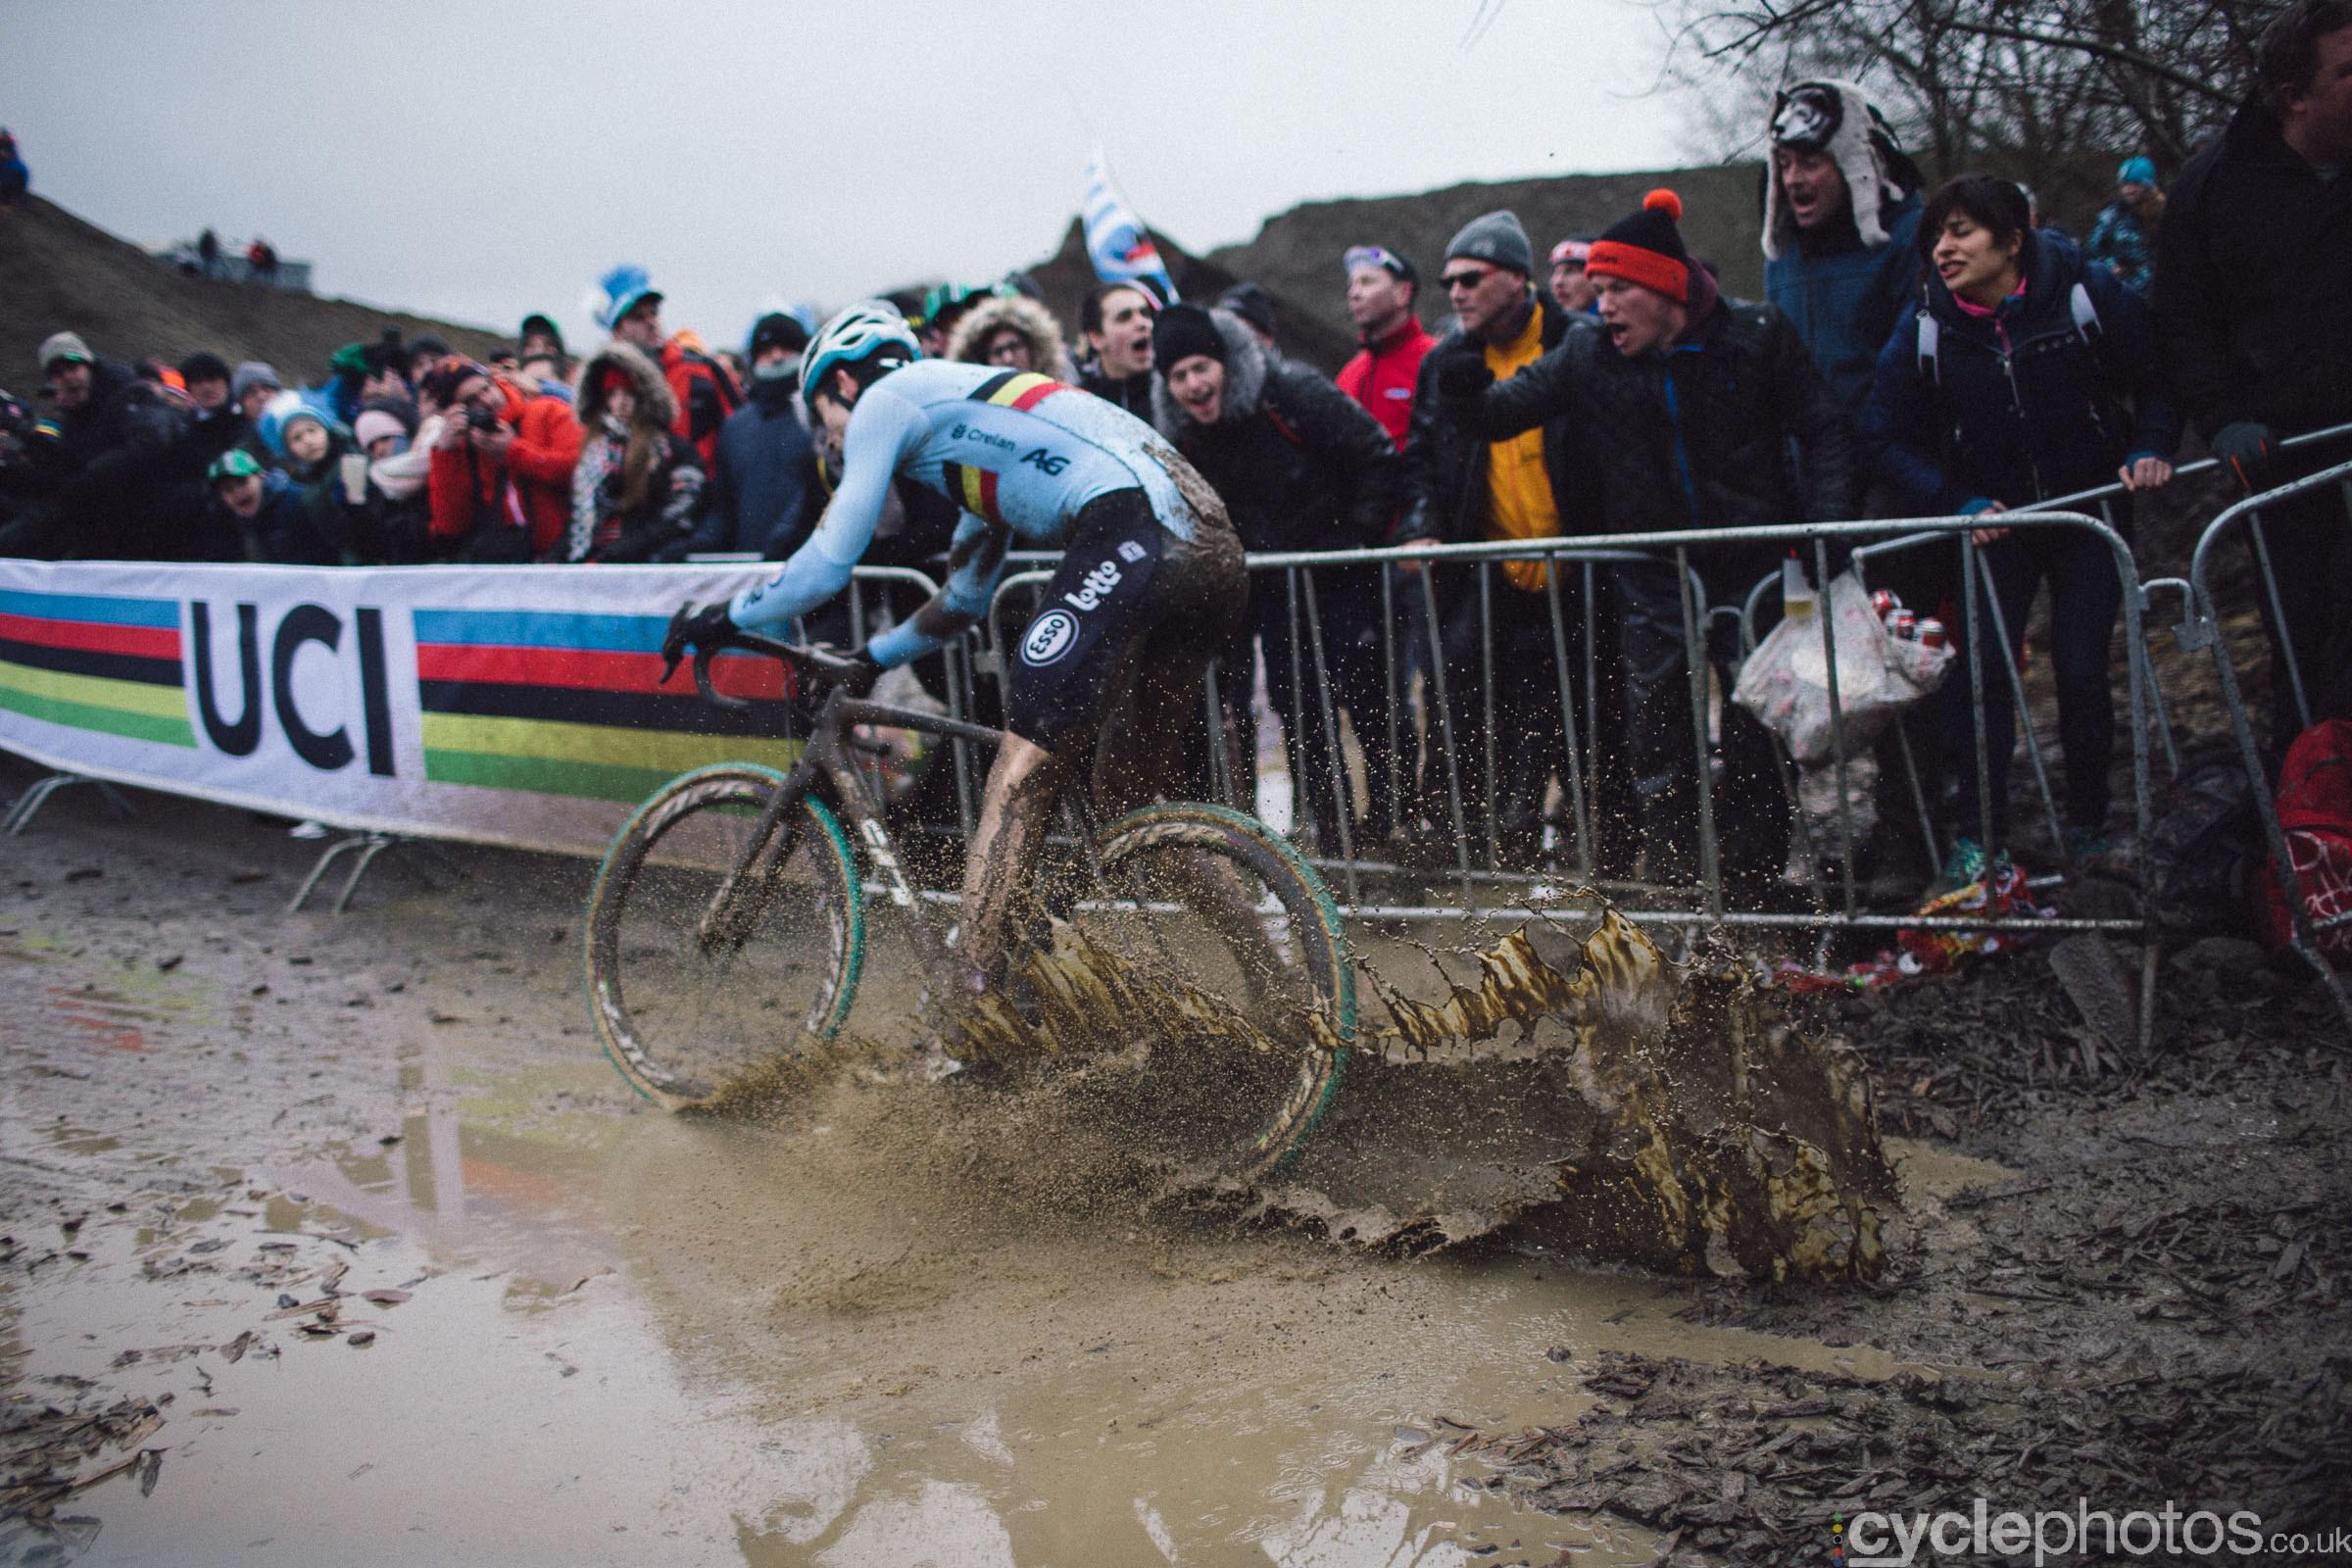 2017-cyclocross-world-championships-bieles-153622-wout-van-aert.jpg